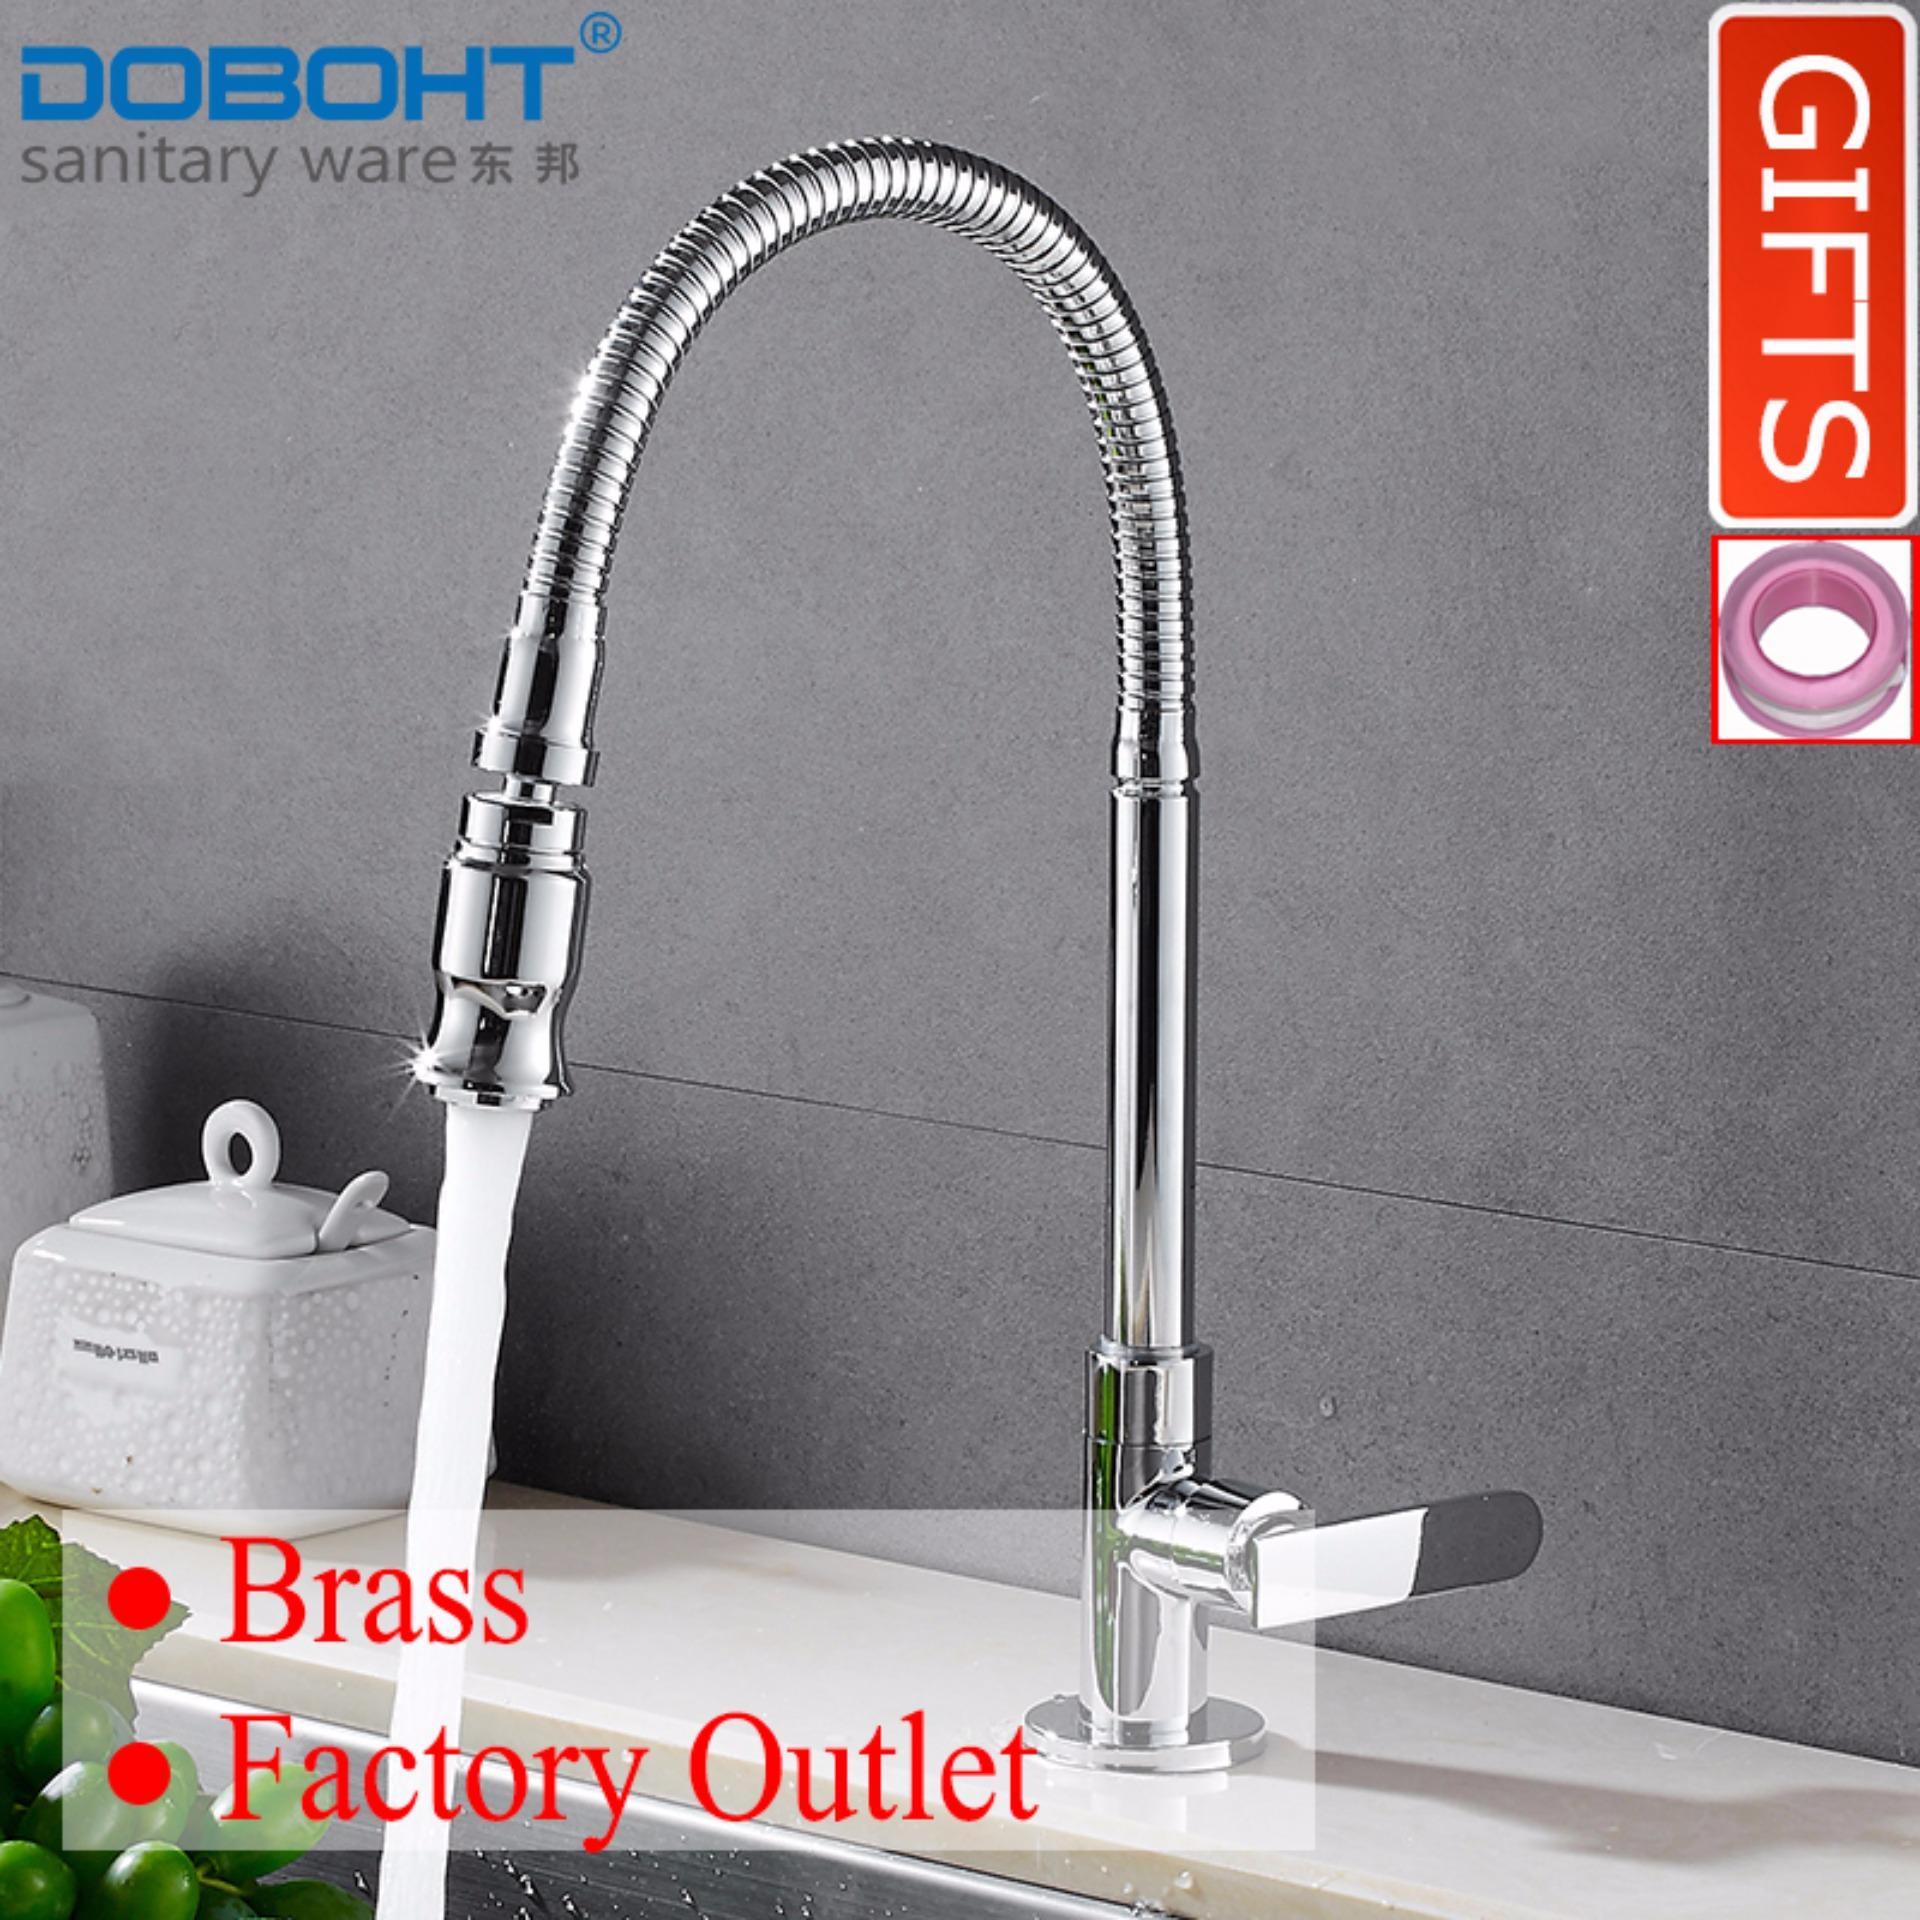 Doboht Brass Bathroom Sink Basin Kitchen Single Cold Tap Faucet Chrome Intl Doboht Discount